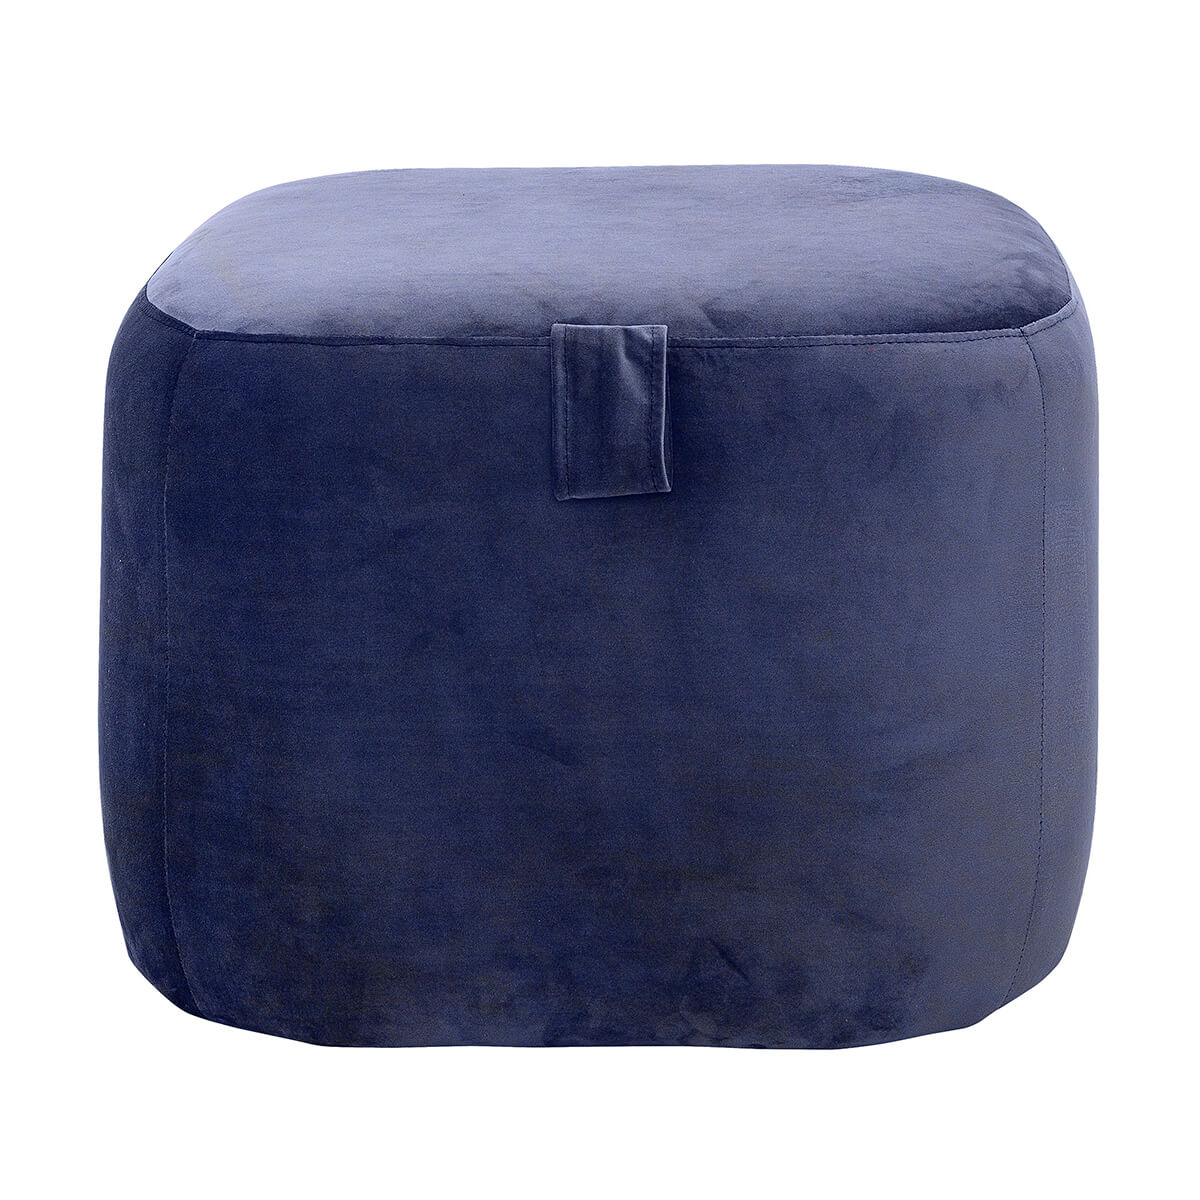 Kék puff minimalista skandináv lakberendezés